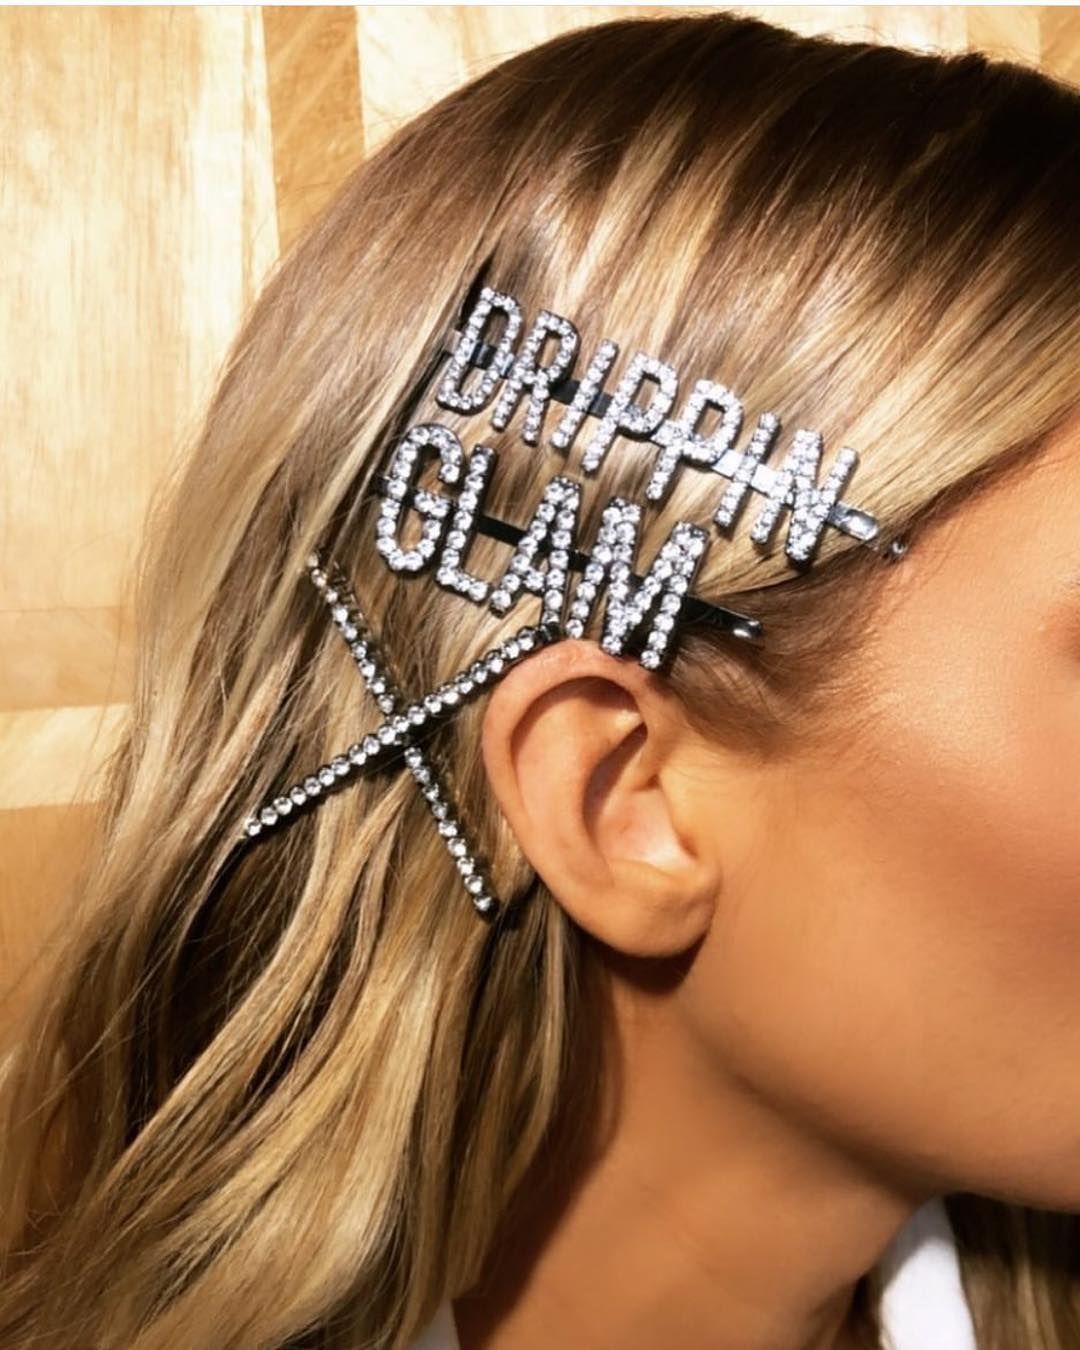 hairaccrssories hair accessories diamonds silver